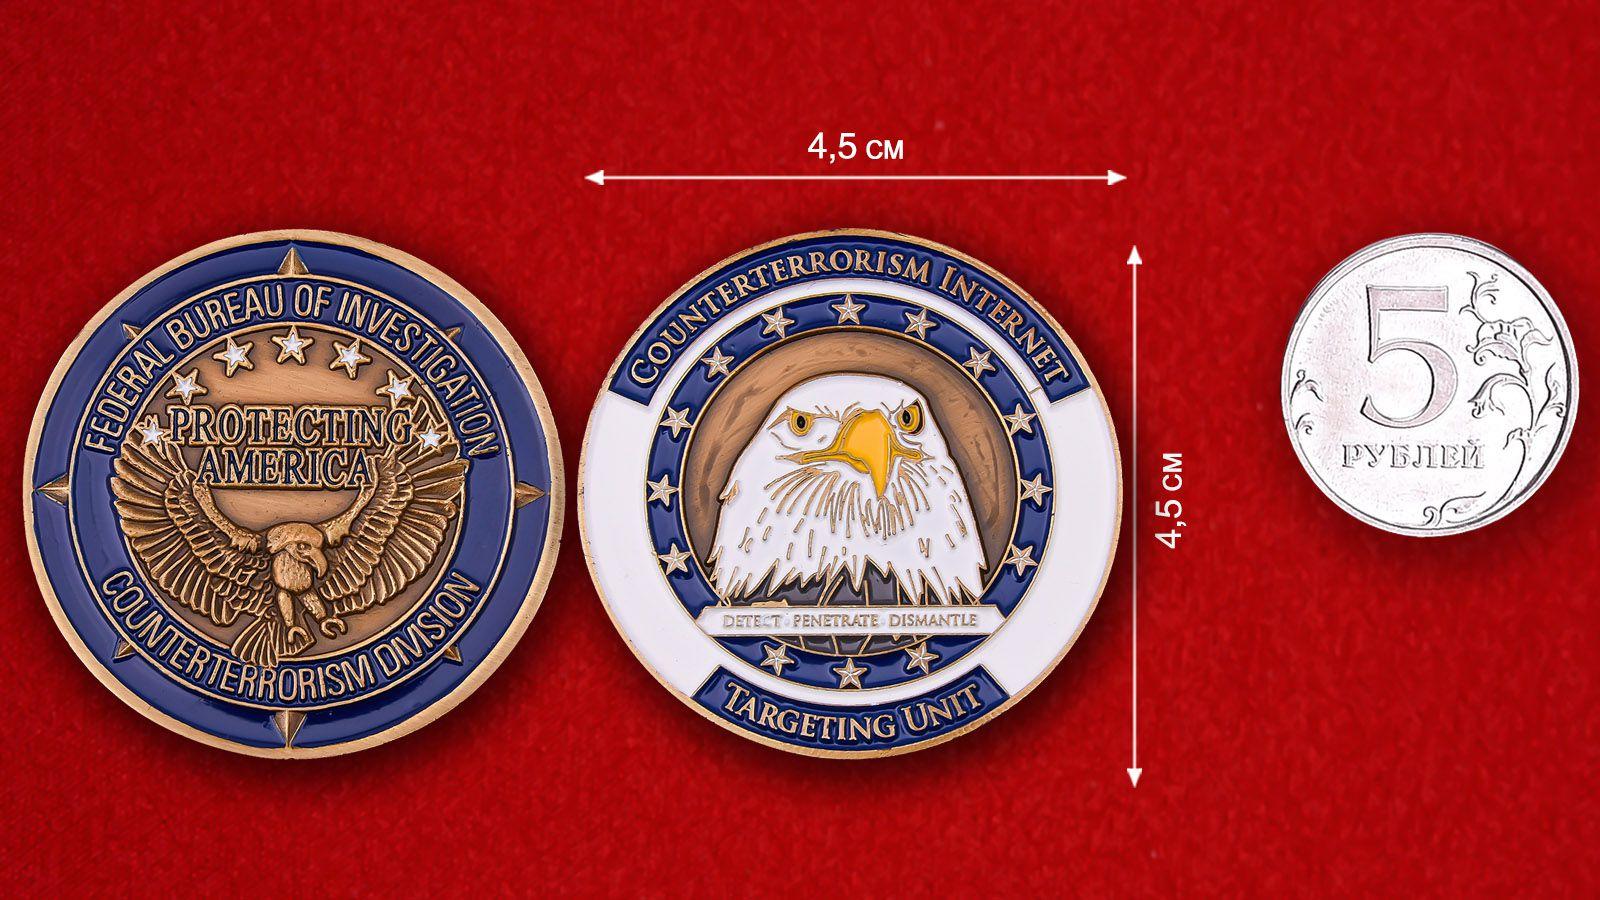 FBI Counterterrorism Division Challenge Coin - comparative size